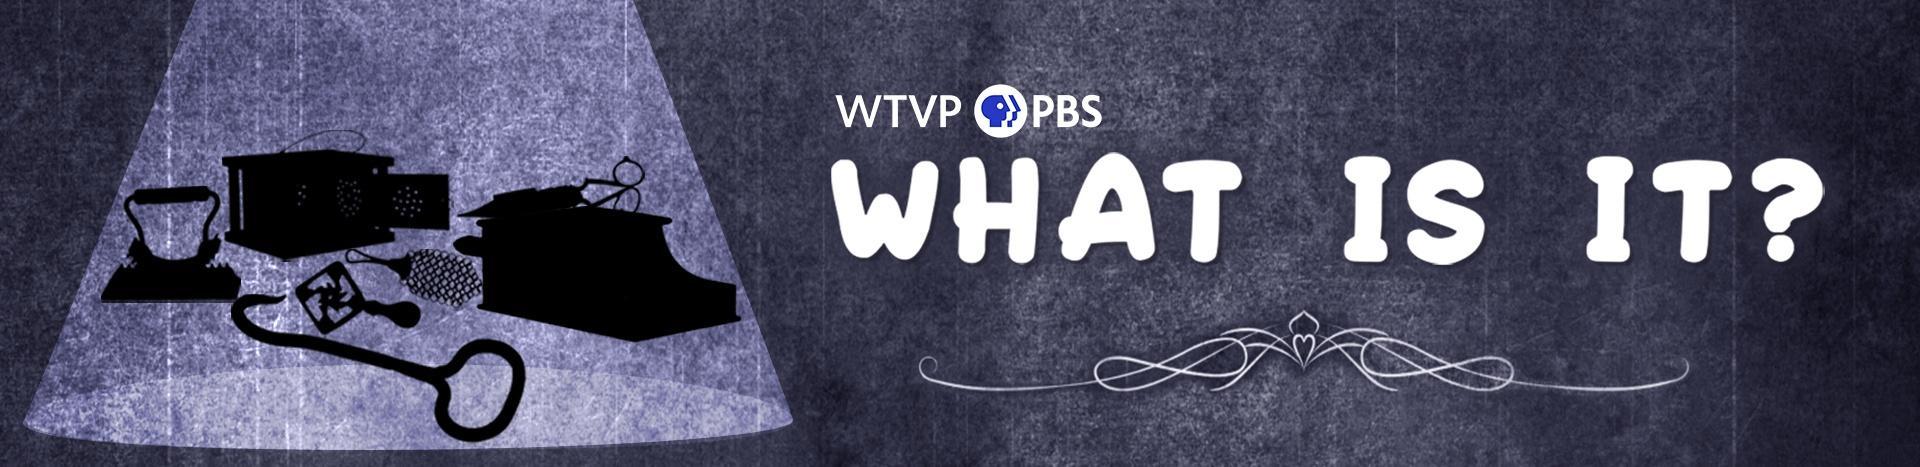 WTVP What is it?